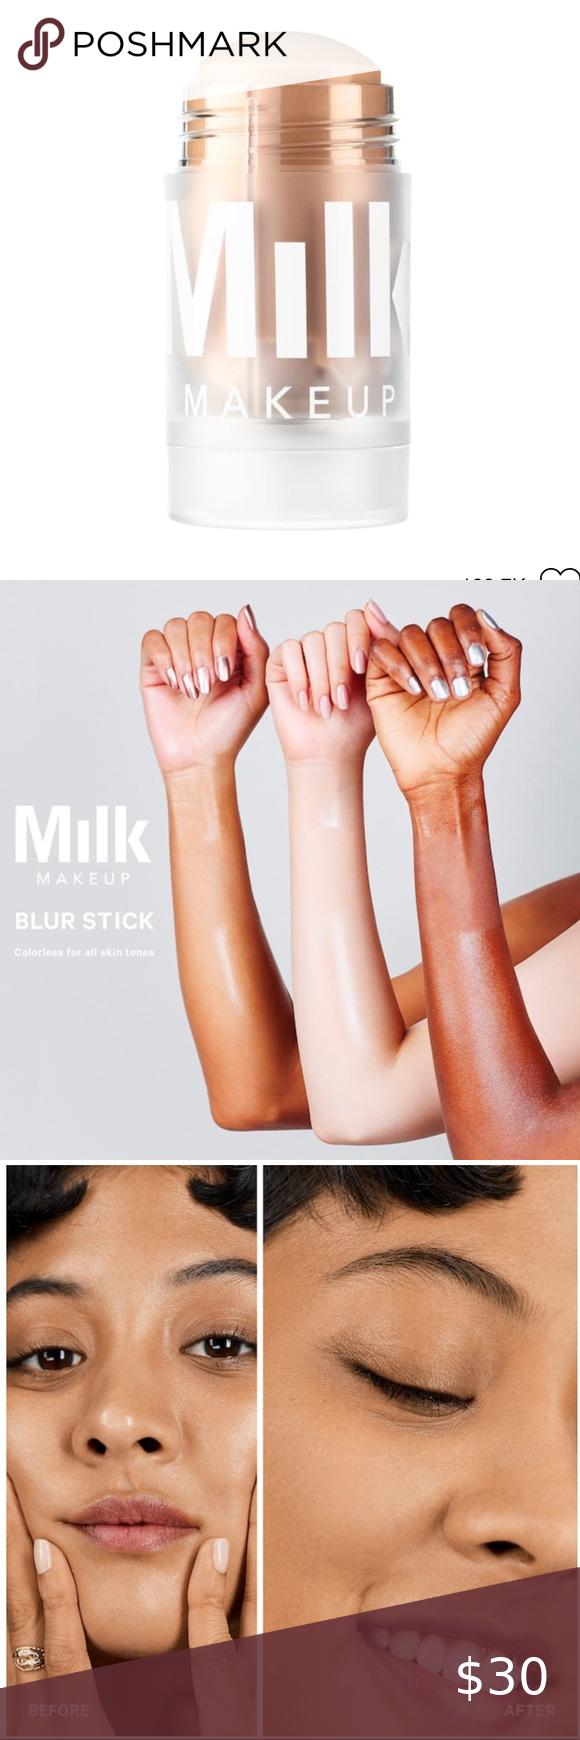 ️ Milk Makeup Blur Stick in 2020 Milk makeup, Milk